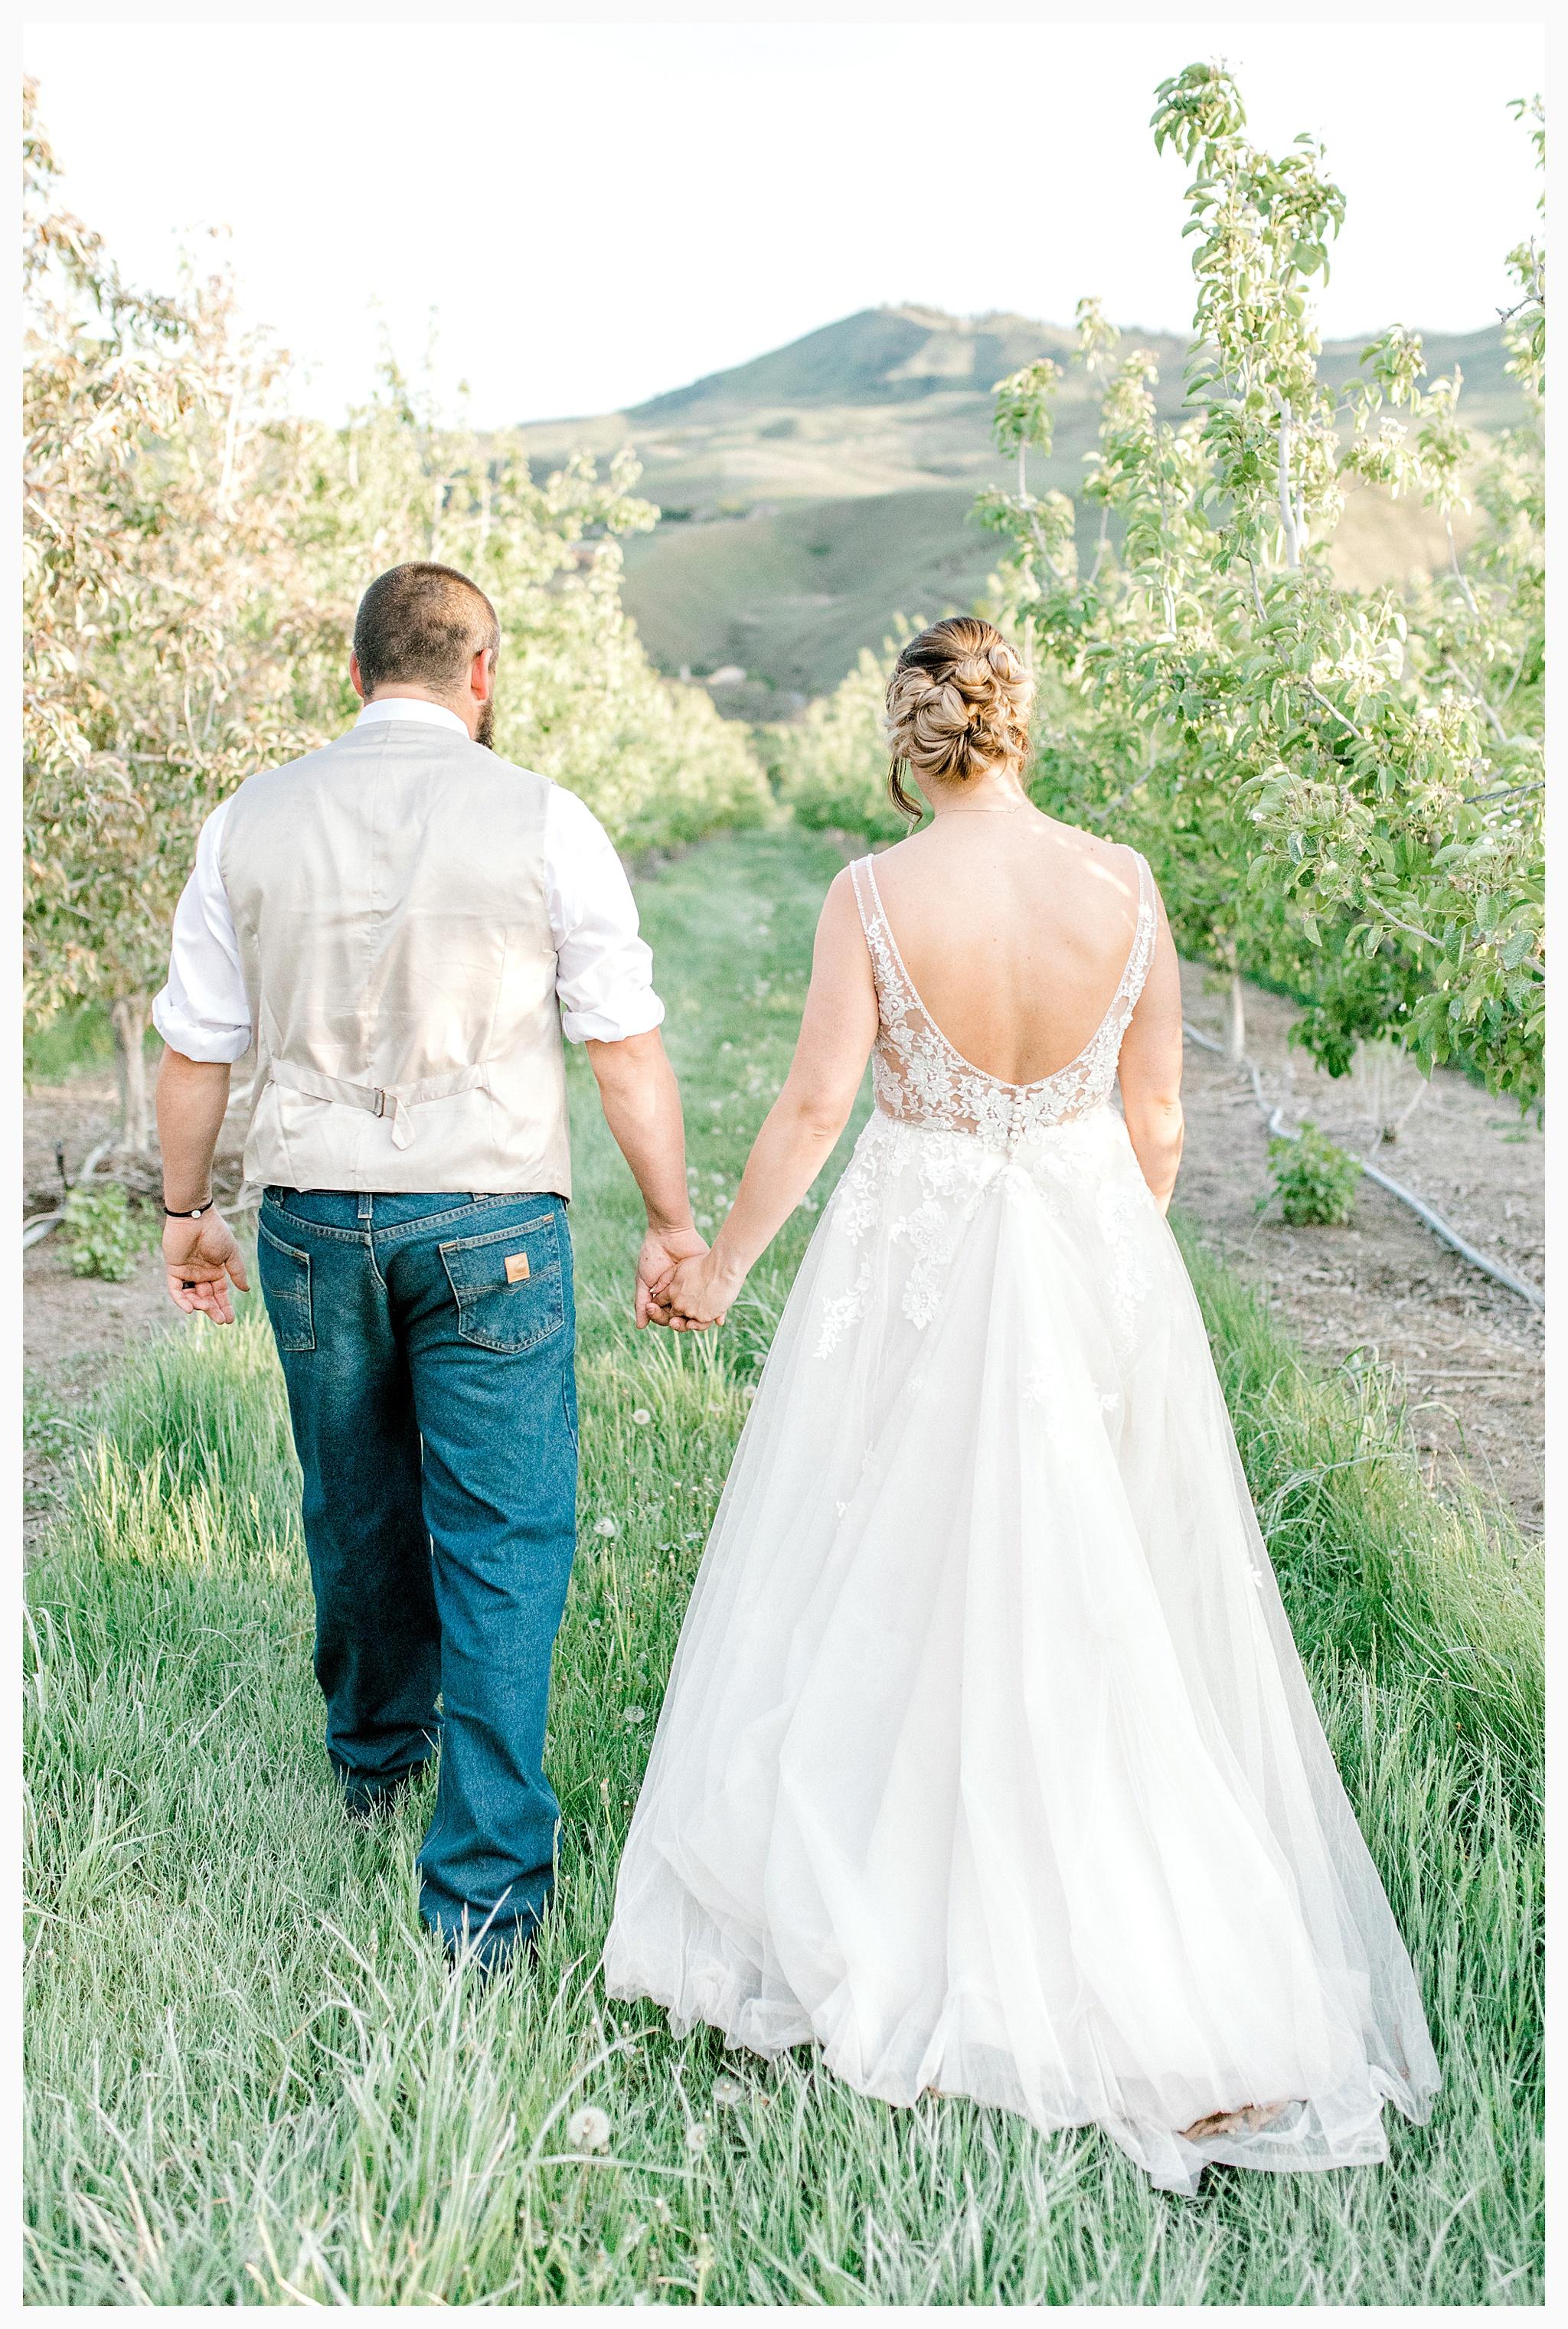 Rustic barn wedding in Wenatchee Washington at Sunshine Ranch on Easy Street, Emma Rose Company Seattle PNW Light and Airy Wedding Photographer_0131.jpg